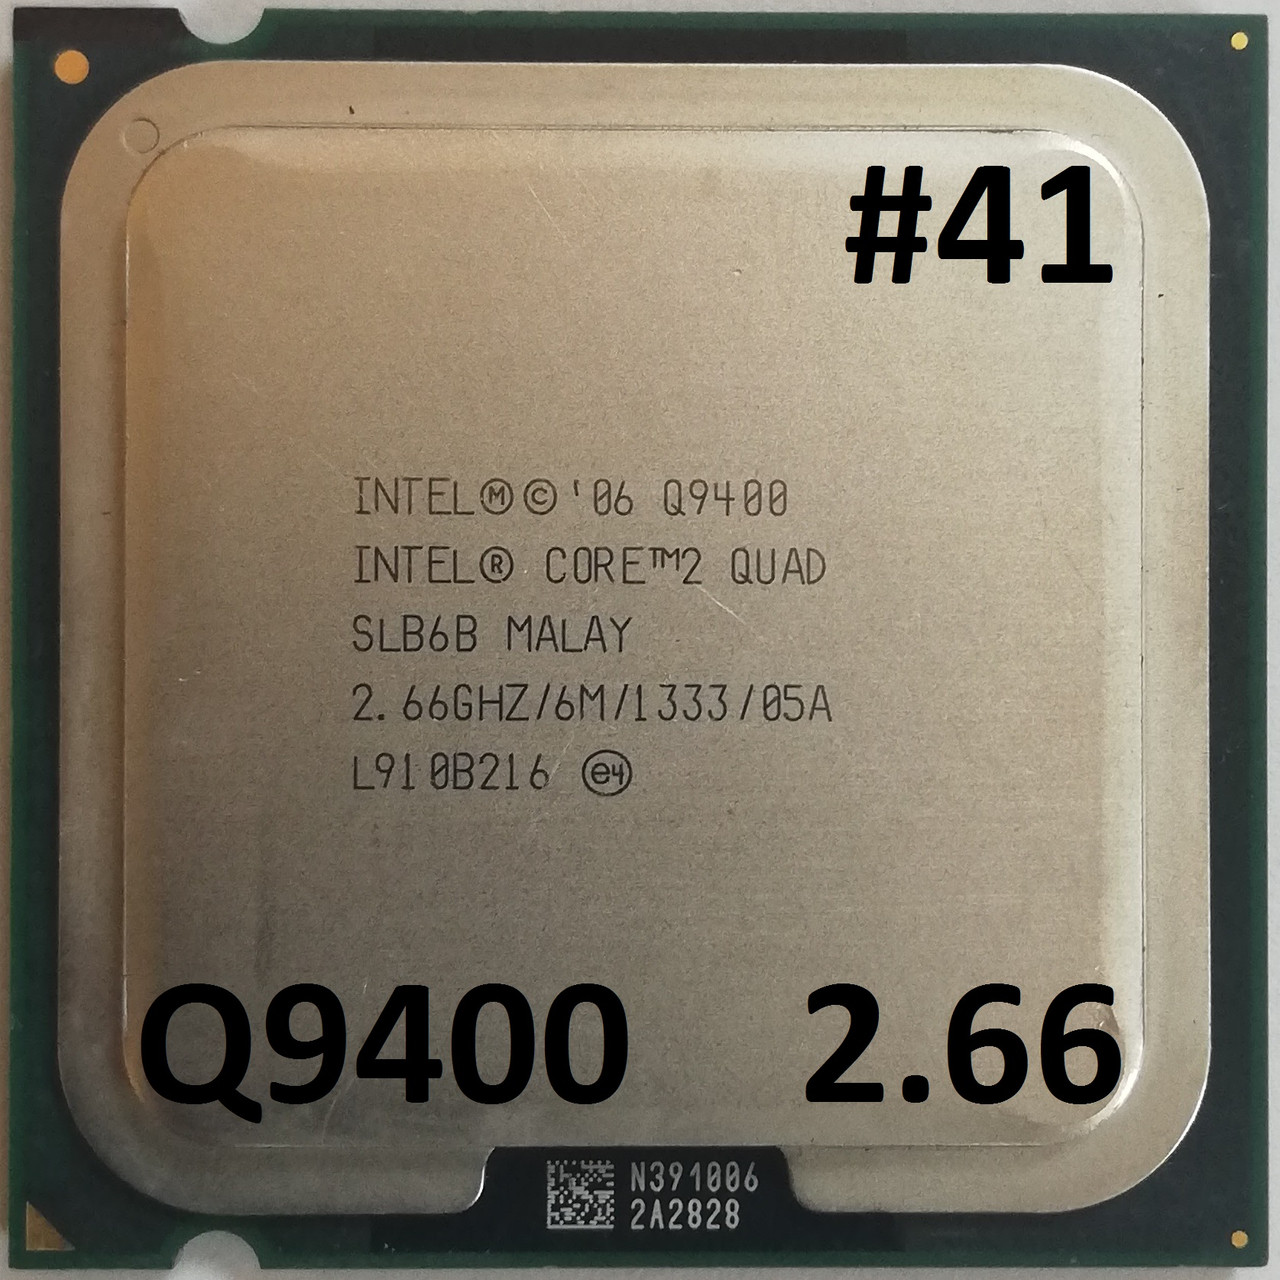 Процессор  ЛОТ #41 Intel® Core™2 Quad Q9400 R0 SLB6B 2.66GHz 6M Cache 1333 MHz FSB Soket 775 Б/У